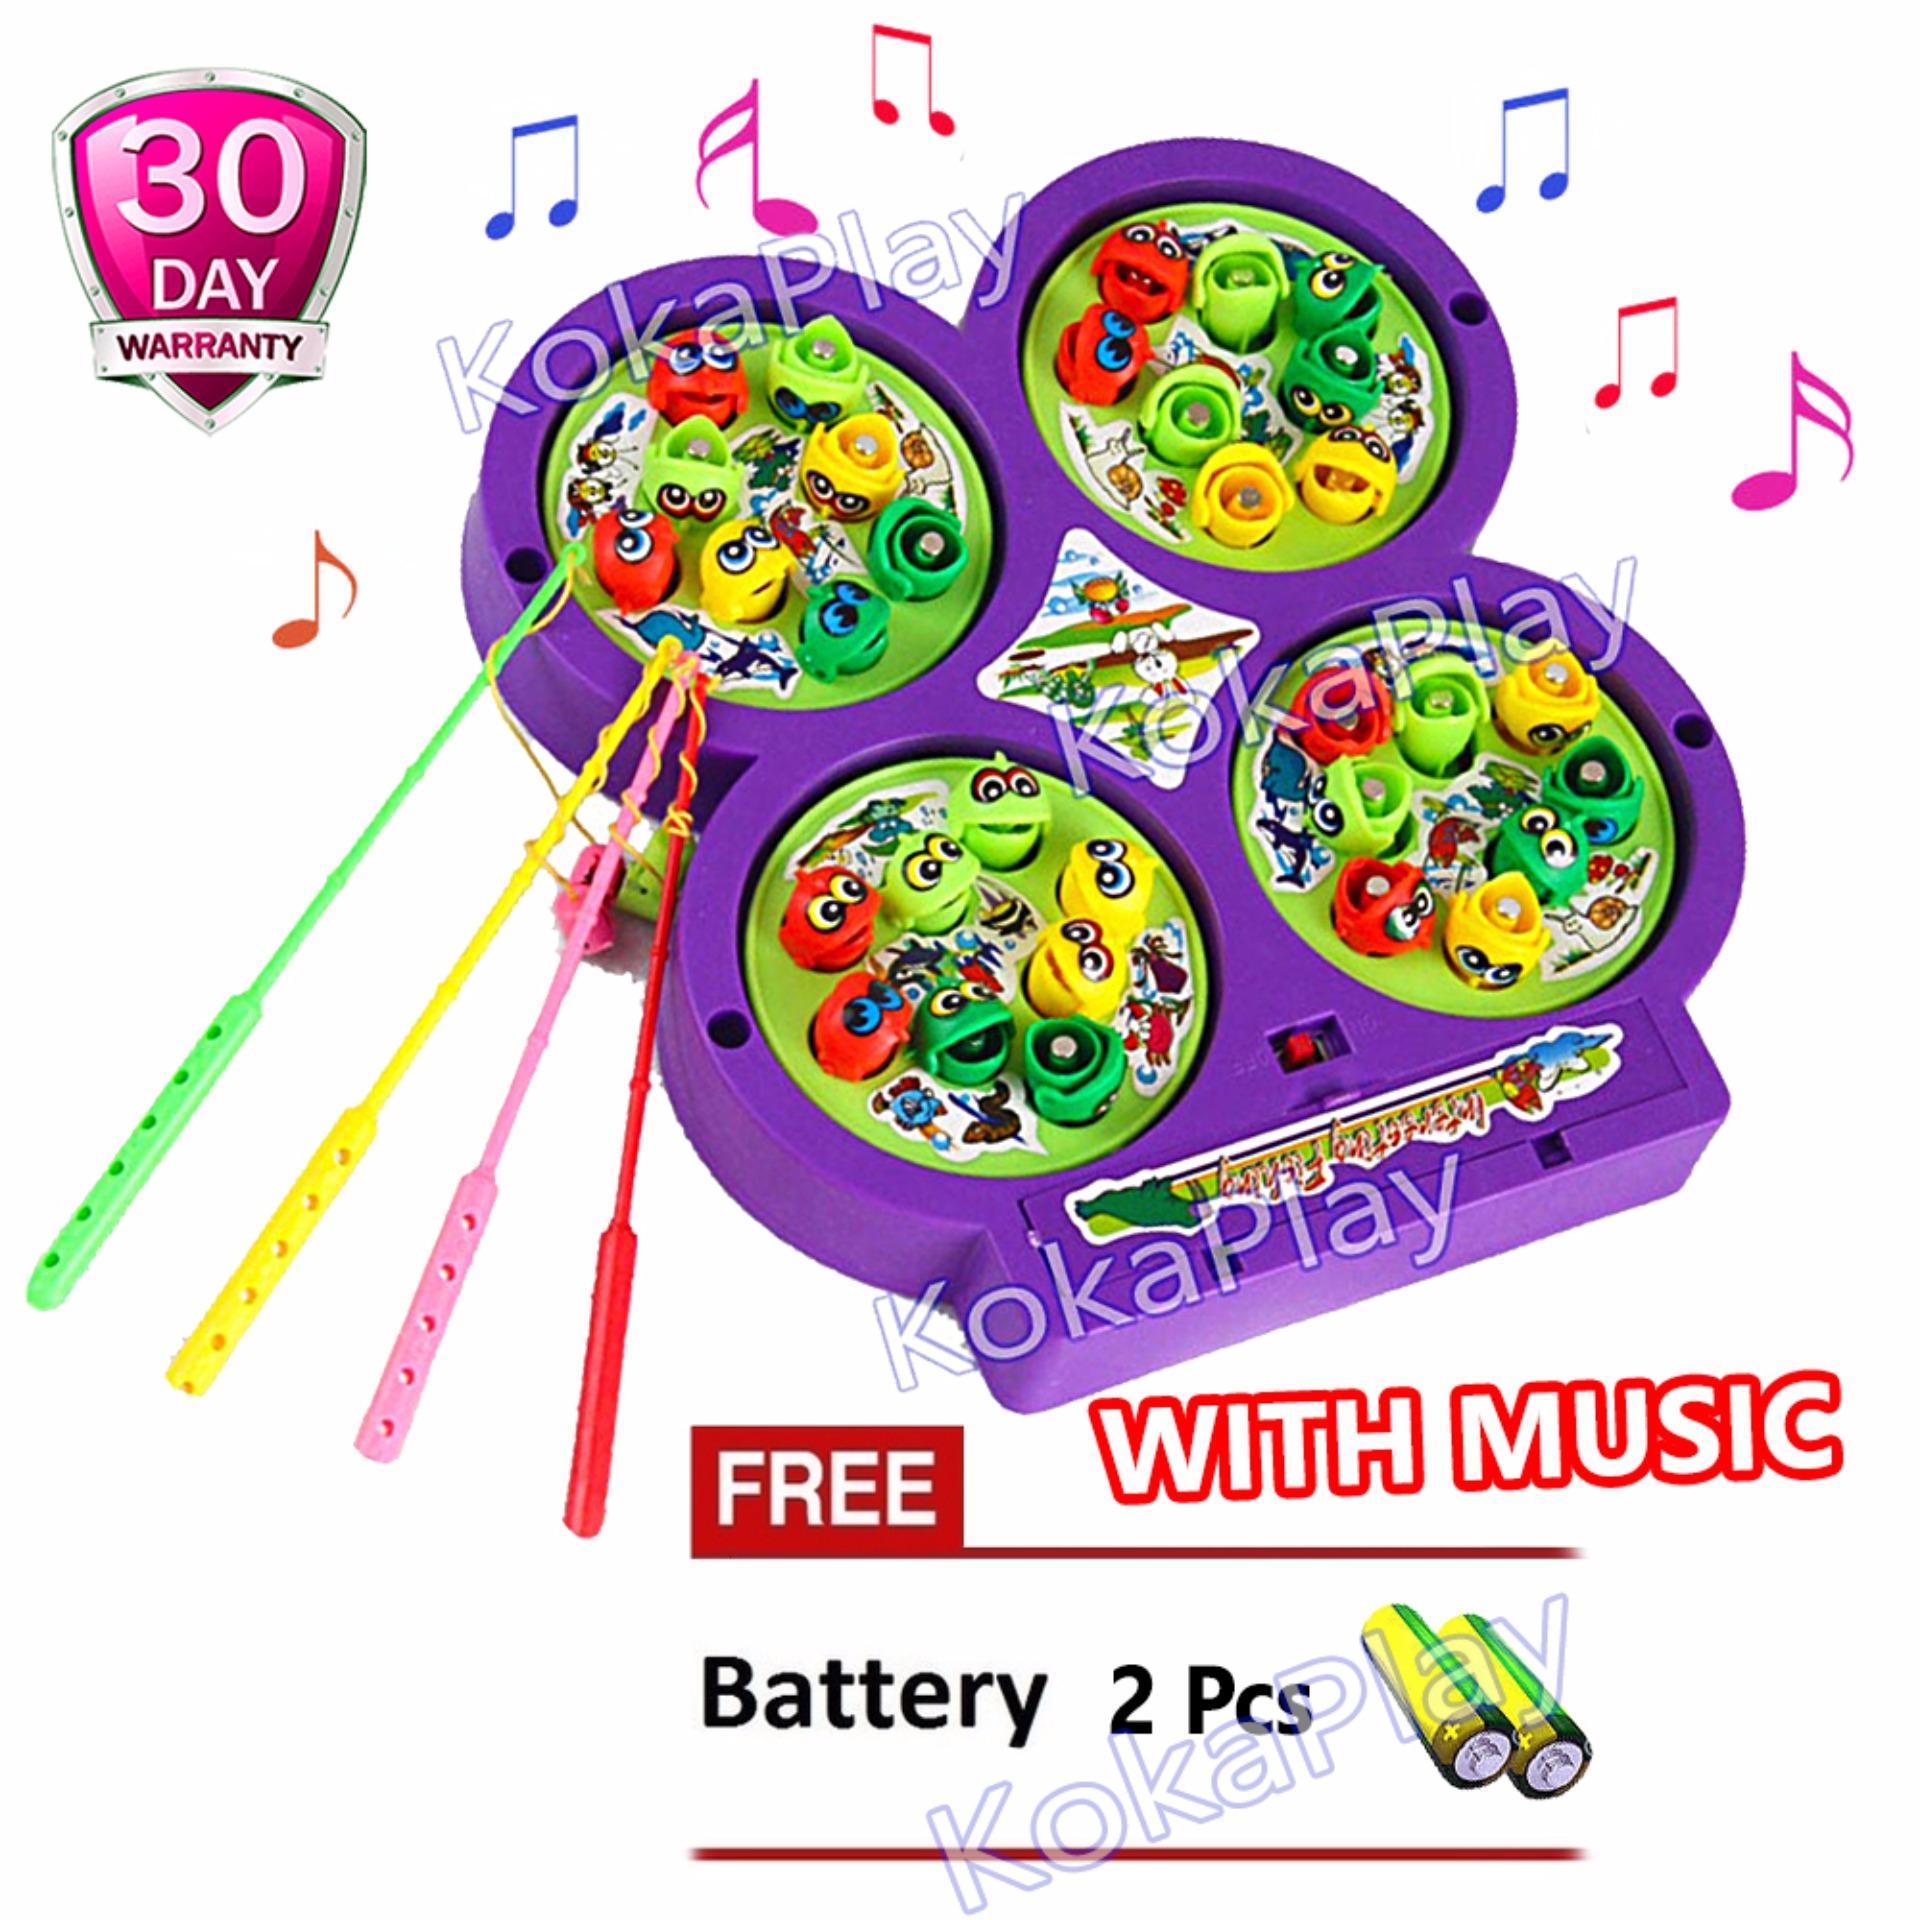 Katalog Kokaplay Magnetic Fishing Game Music Mainan Piano Pancing Ikan Magnet Musik 4 Kolam Free 2 Baterai Kokaplay Terbaru